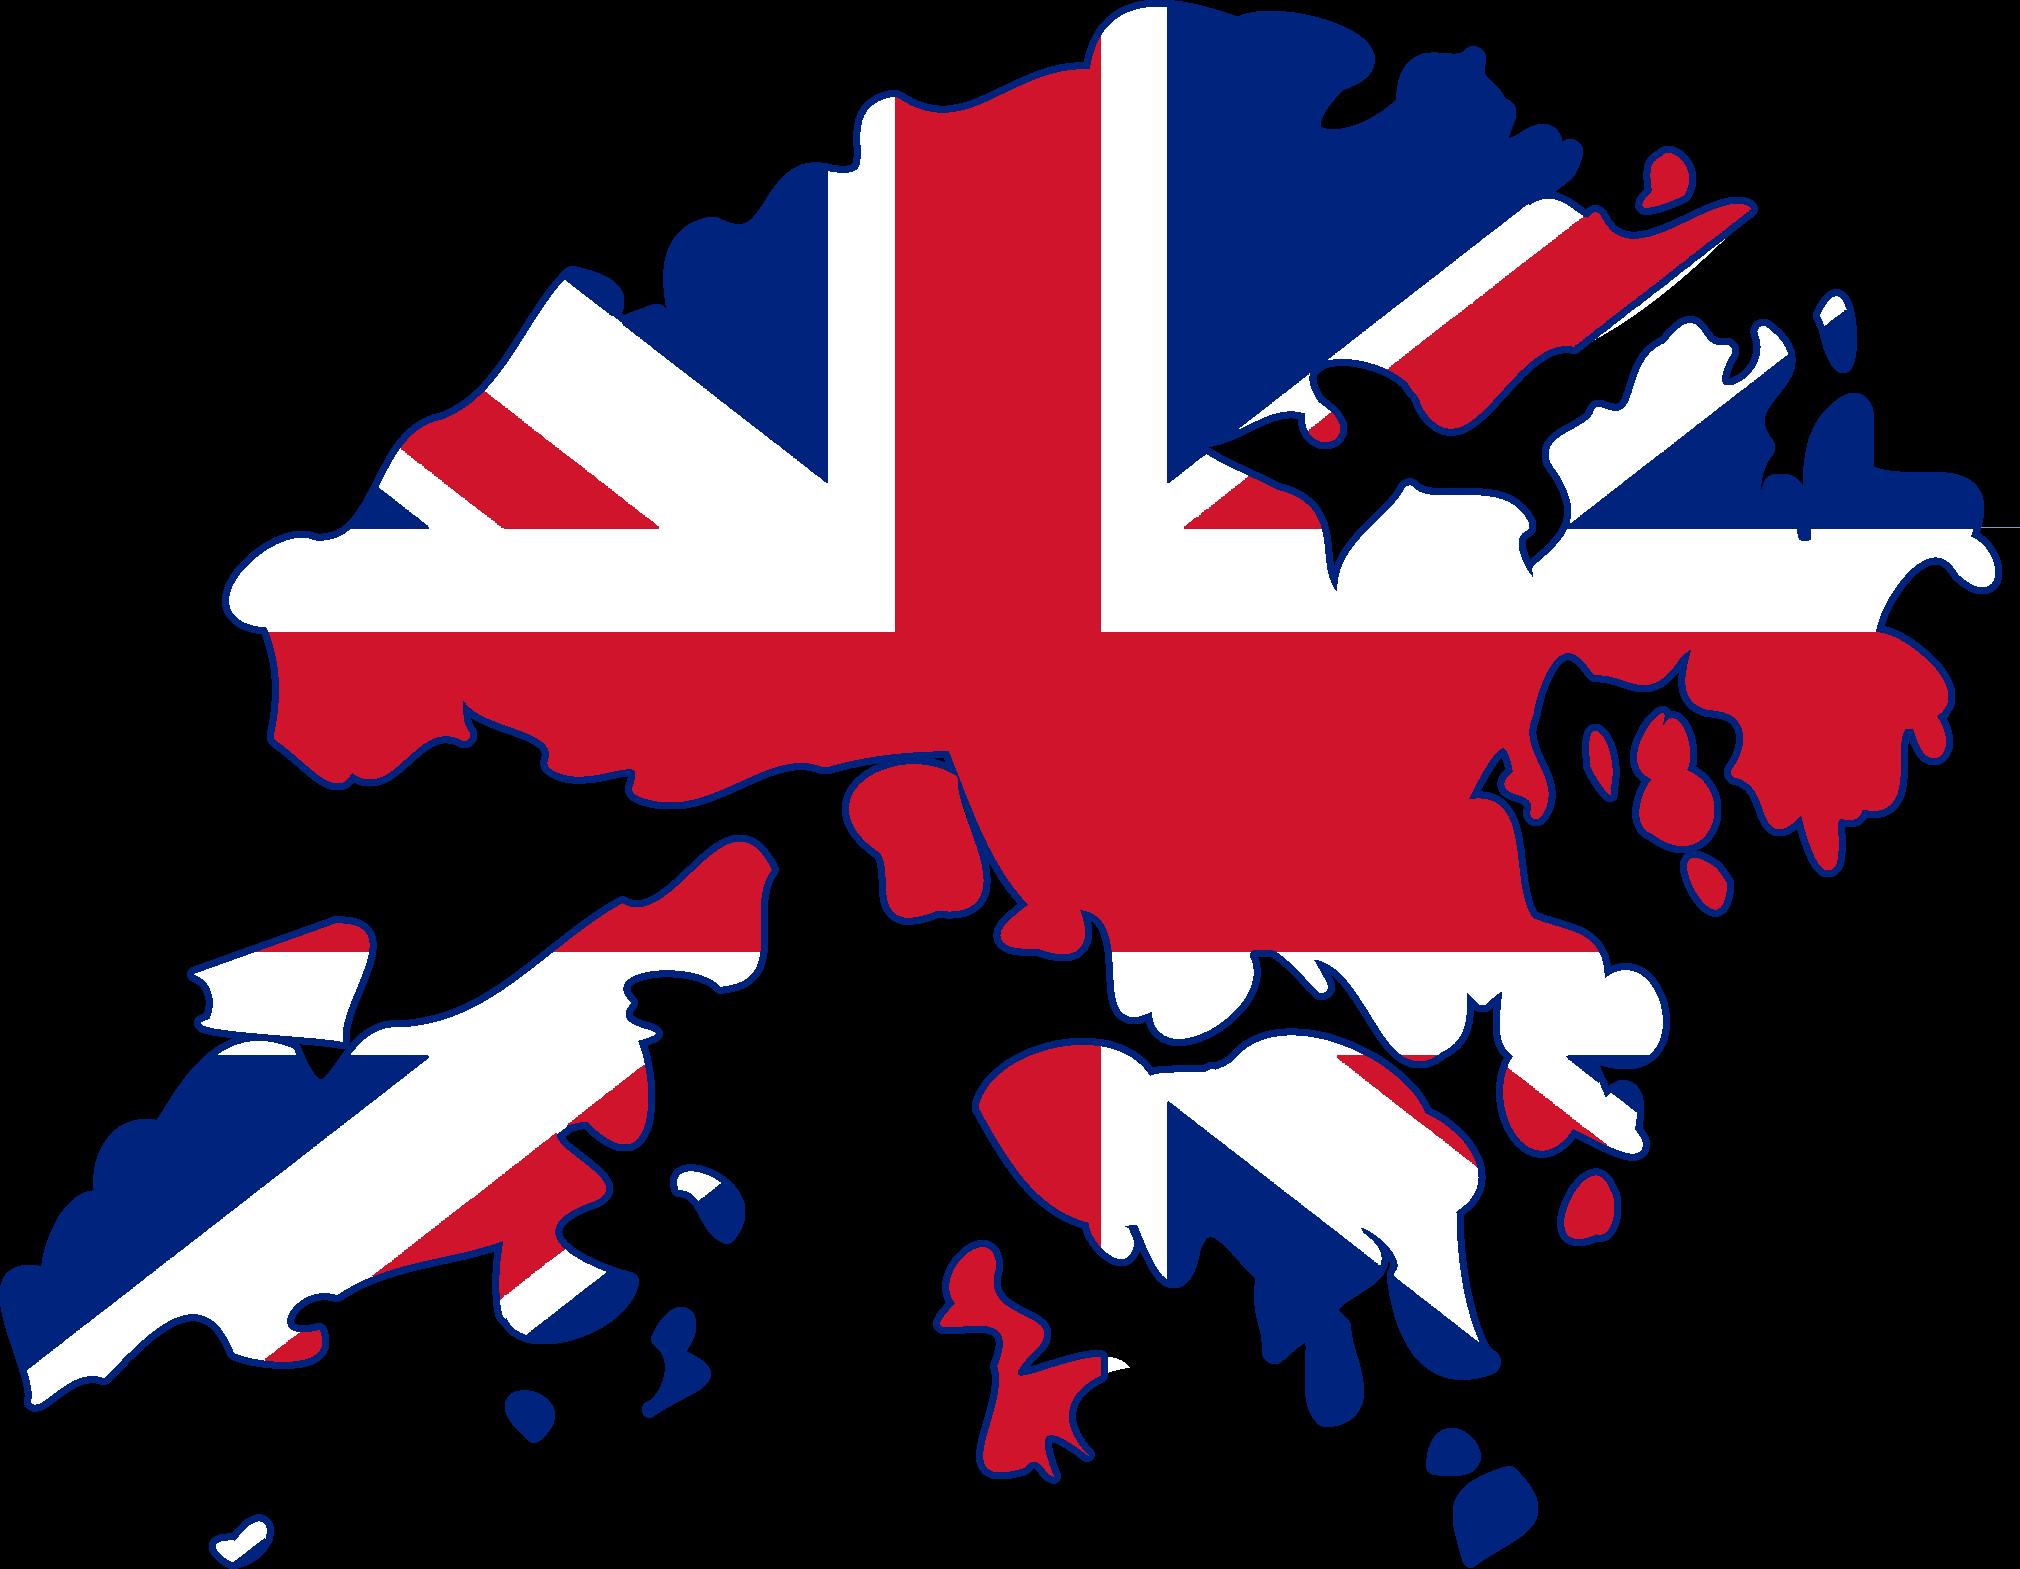 [img]http://upload.wikimedia.org/wikipedia/commons/2/24/Flag_Map_of_British_Hong_Kong_%281841_-_1997%29.png[/img]